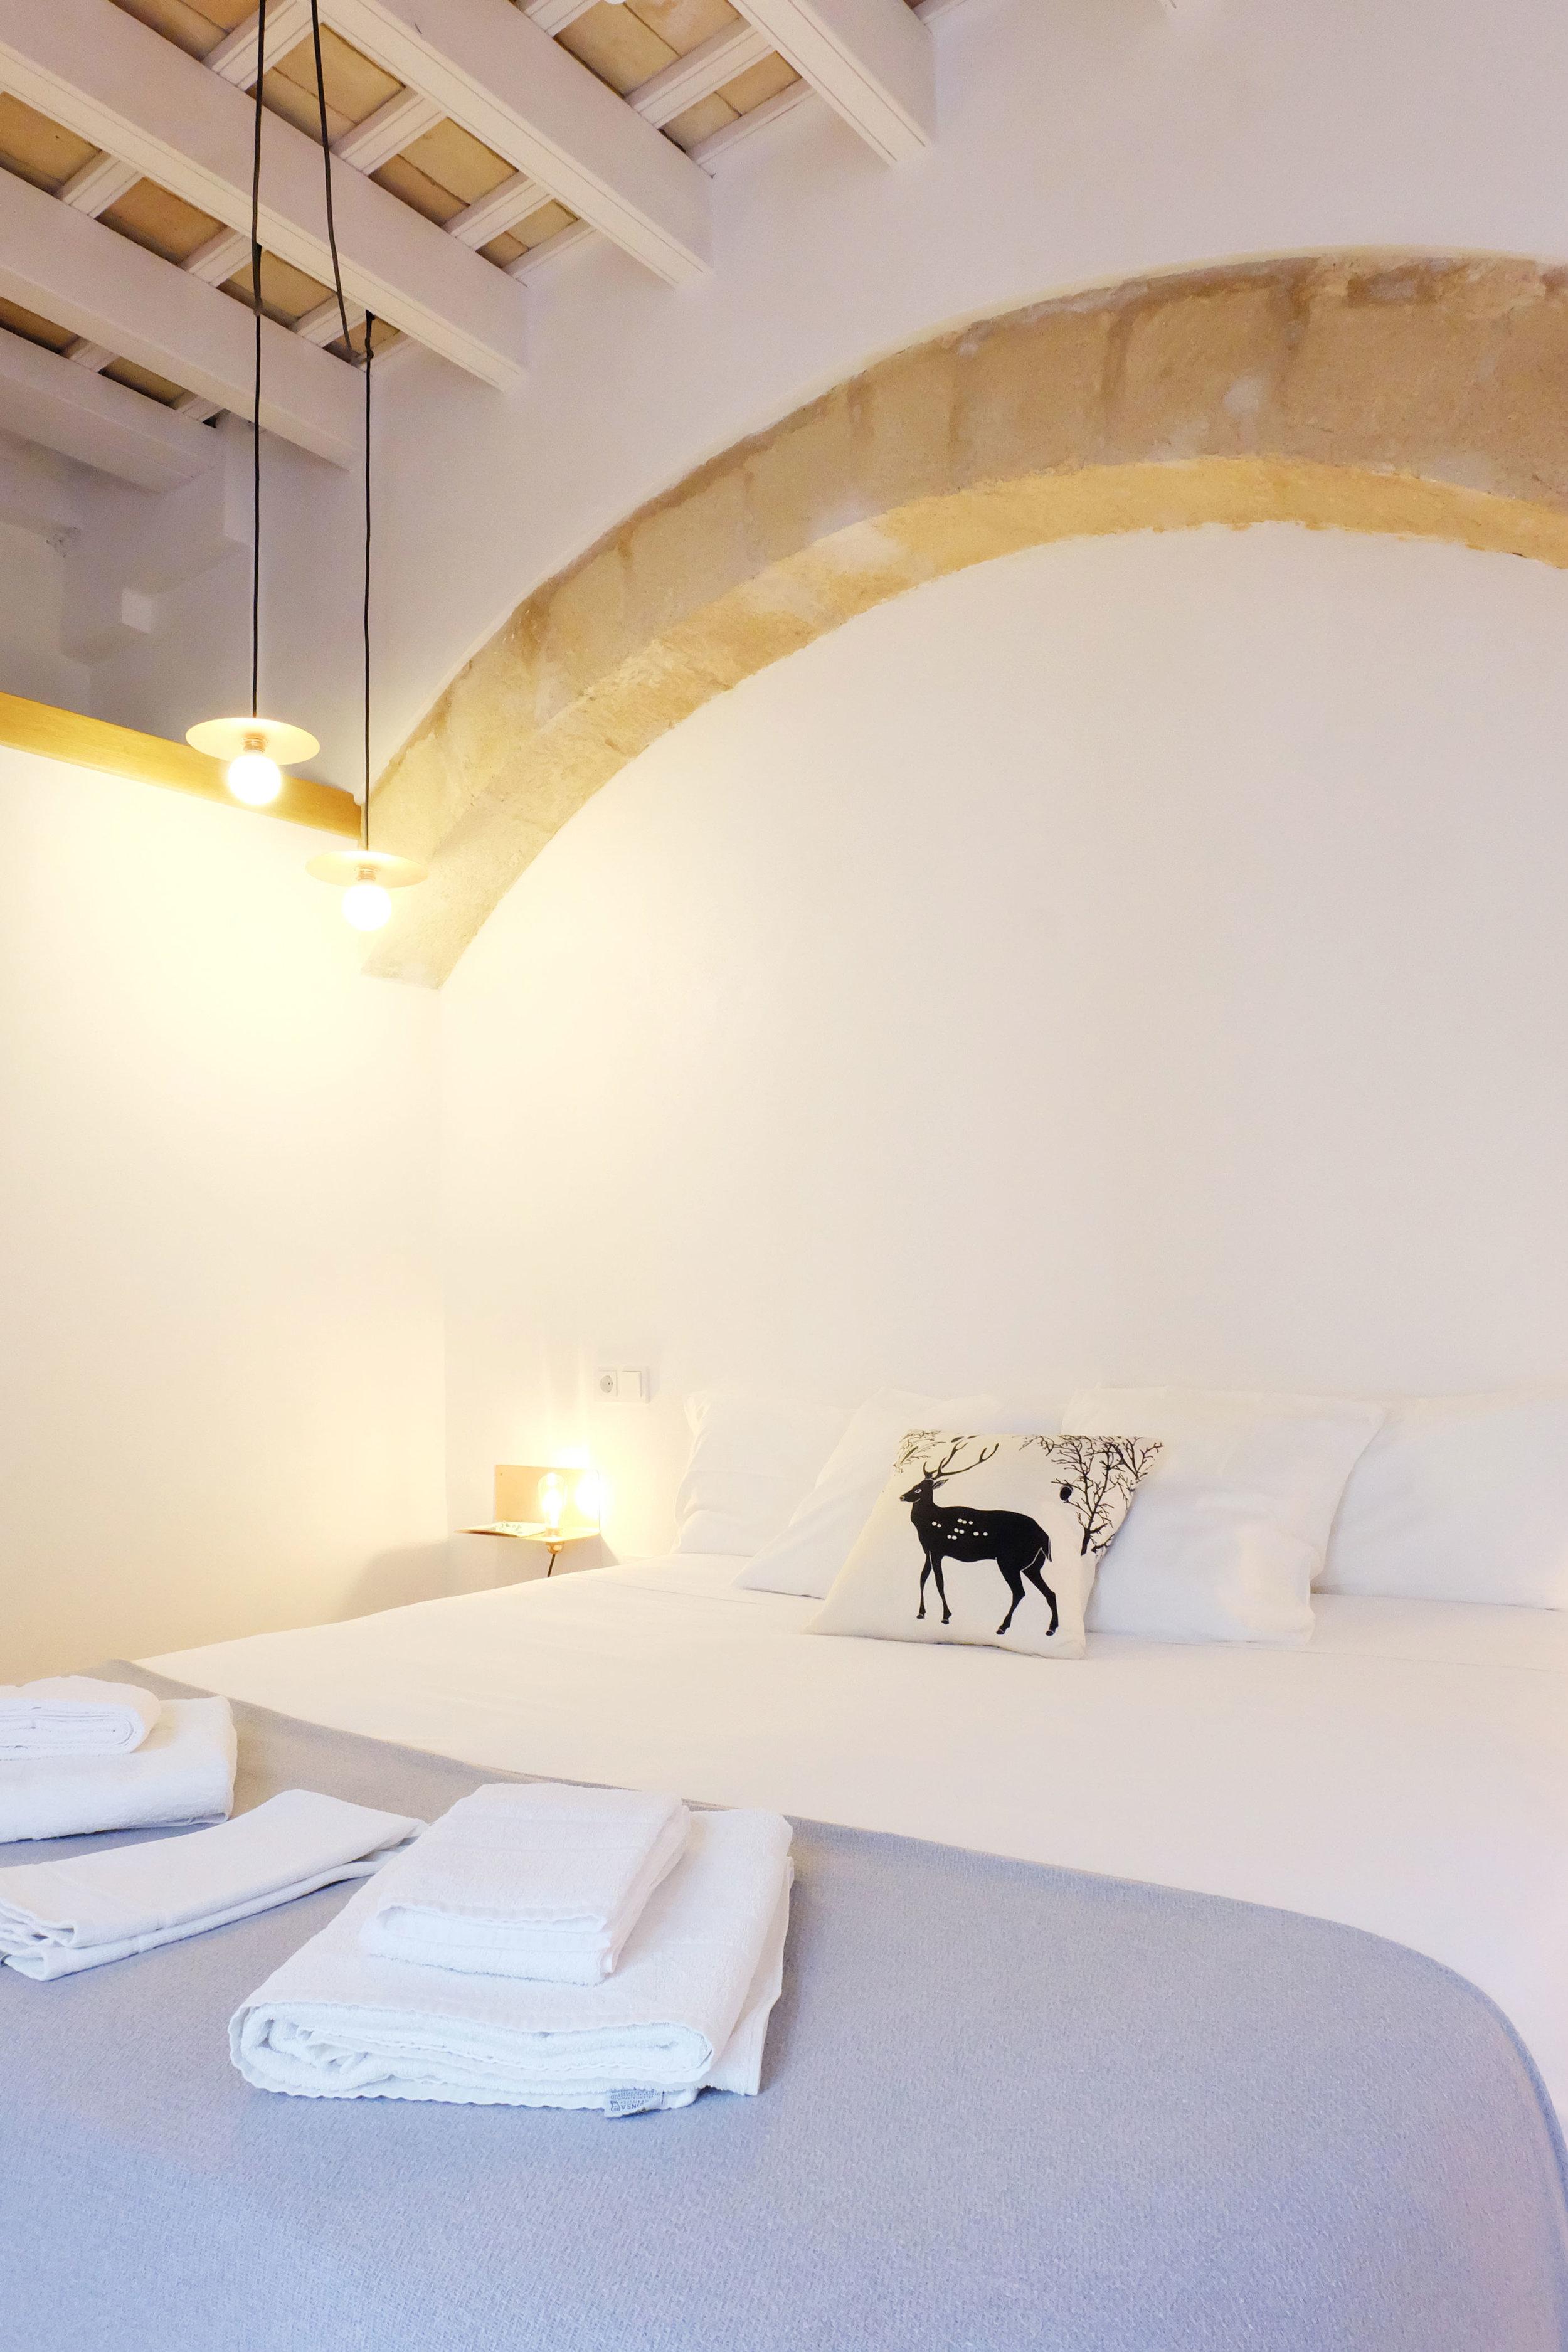 Hotel-Casa-de-Huespedes-Santa-Maria-Habitacion-2-1.jpg